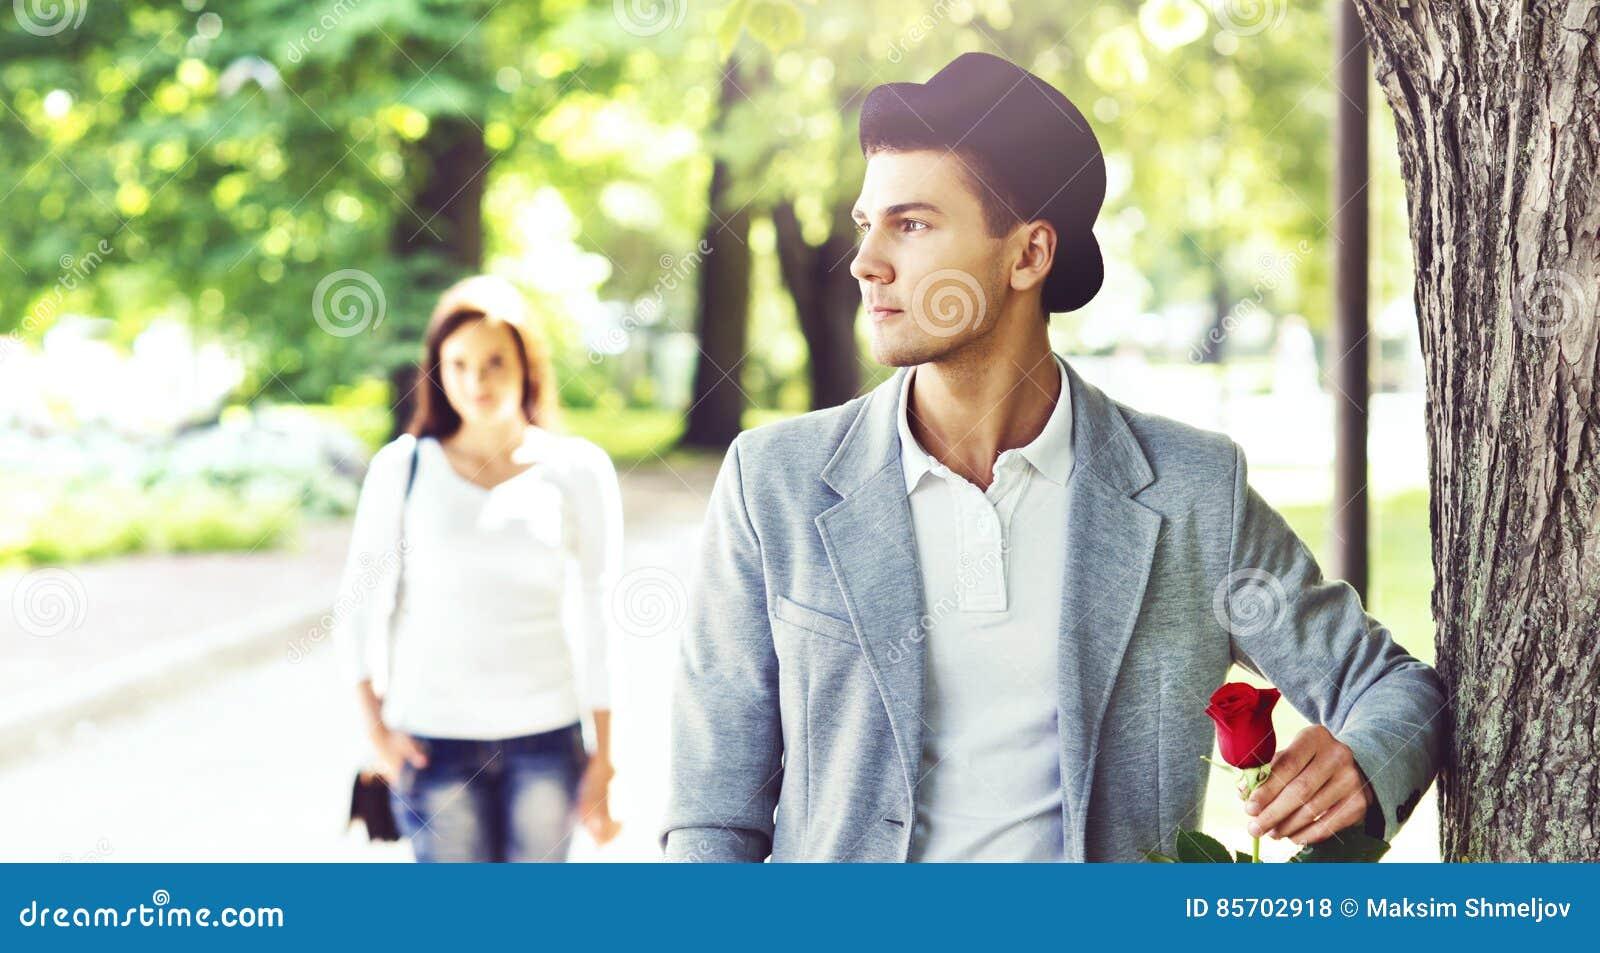 Dating stilig man hastighet dating Birmingham Muslim